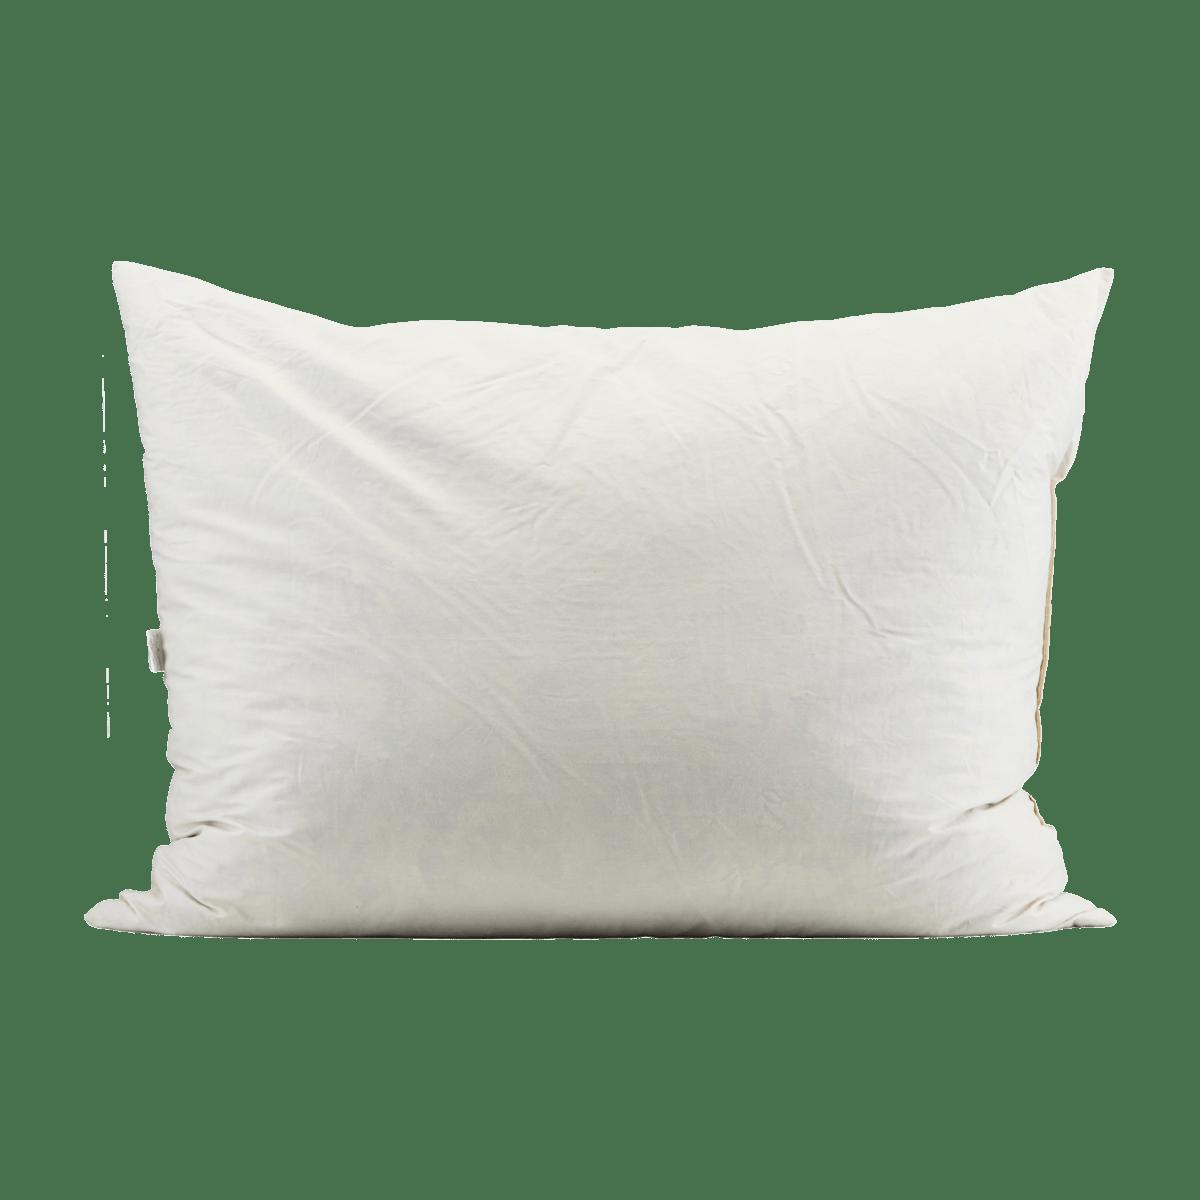 Bílý polštář 50x70 cm